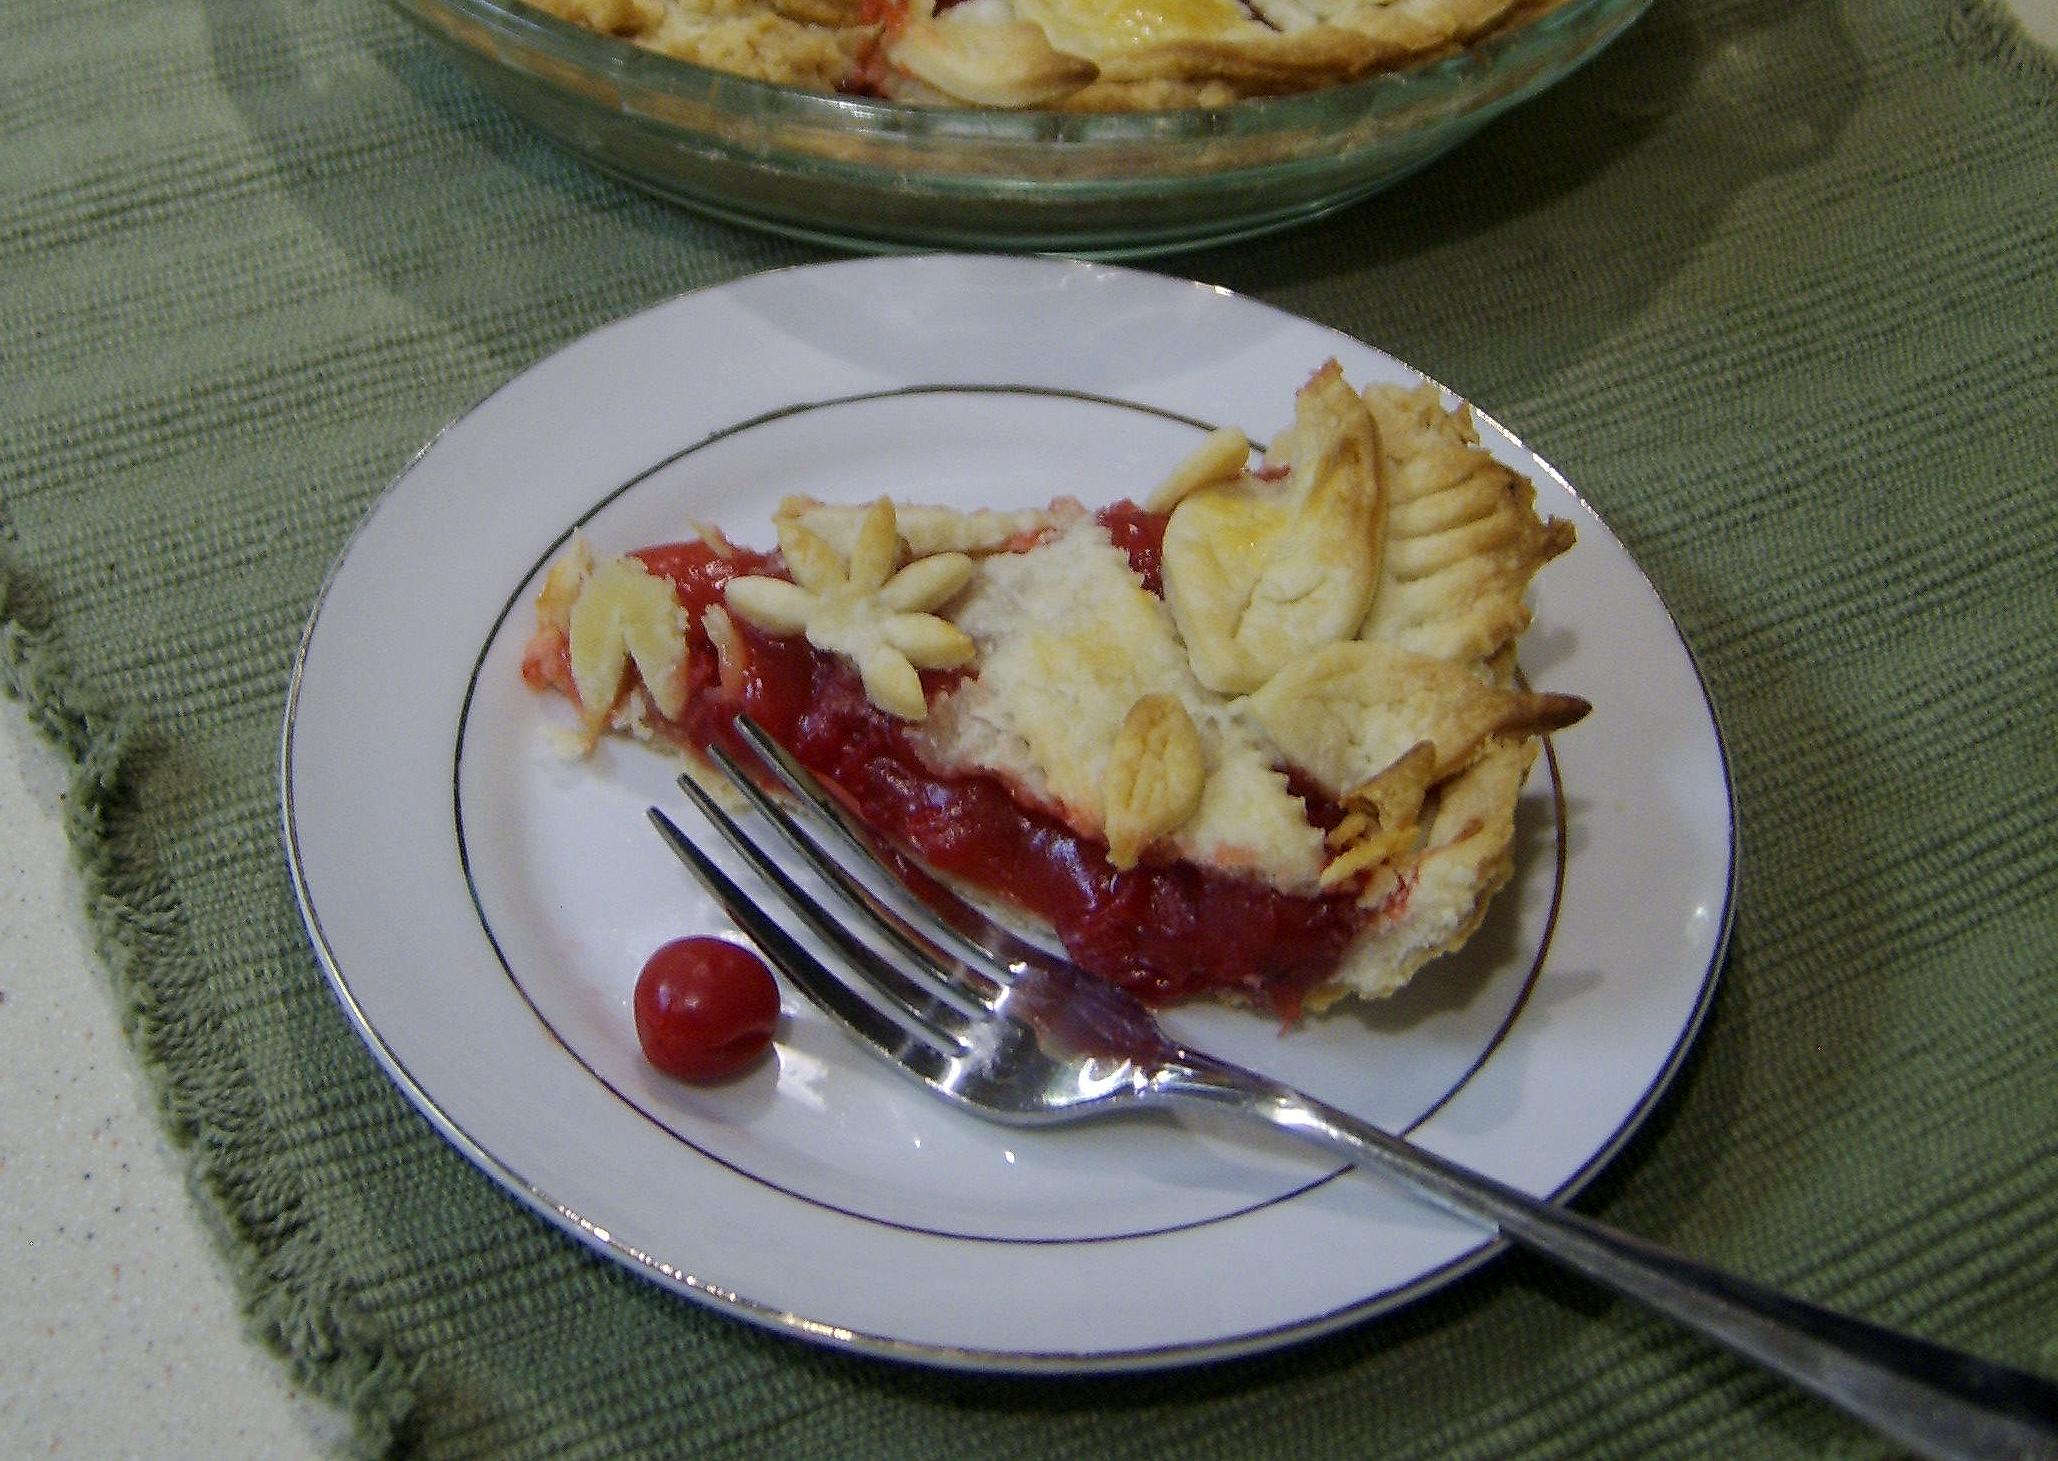 Best Cherry Pie image